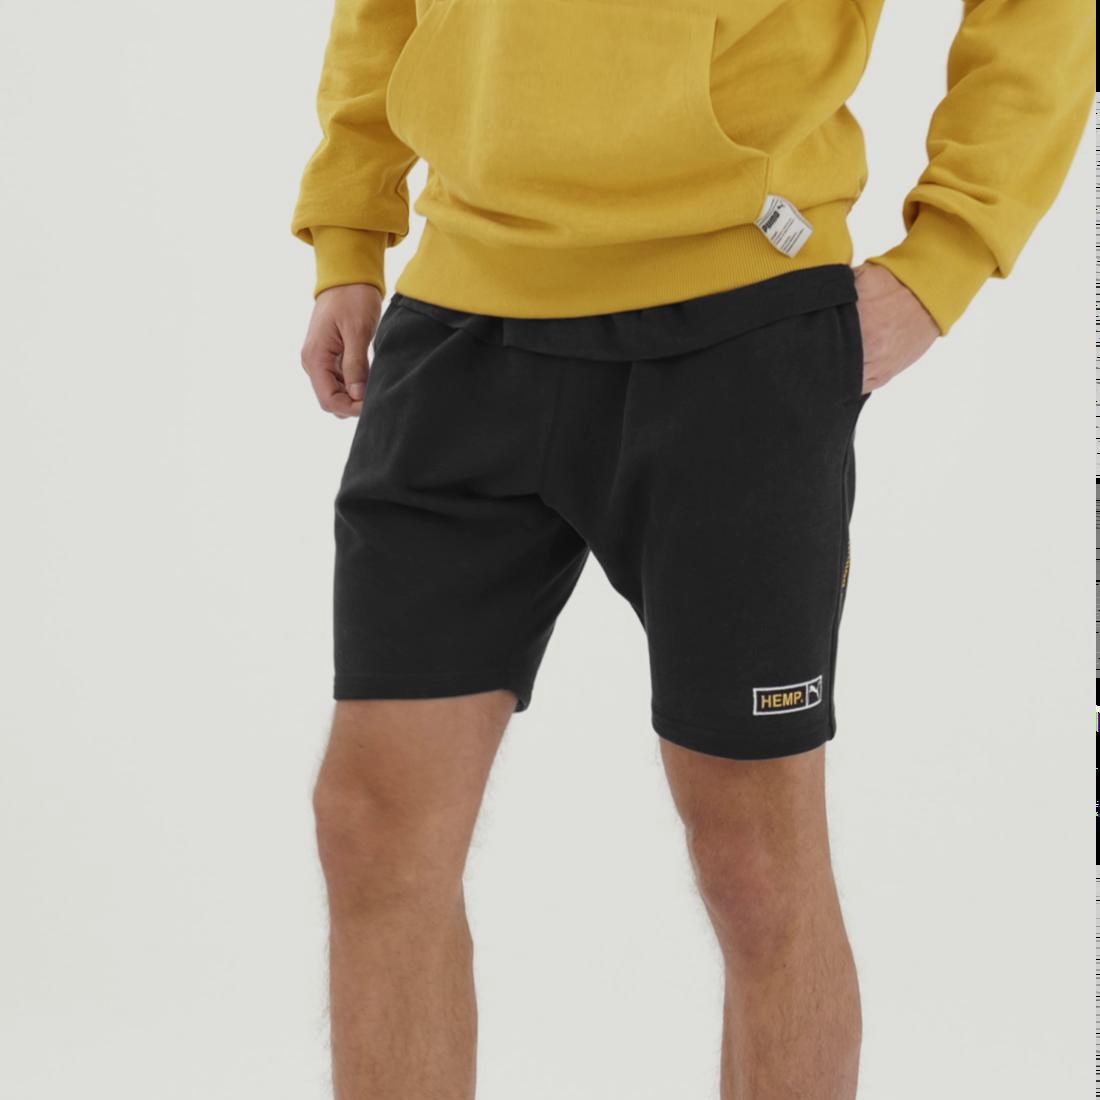 Image PUMA Hemp Men's Shorts #7